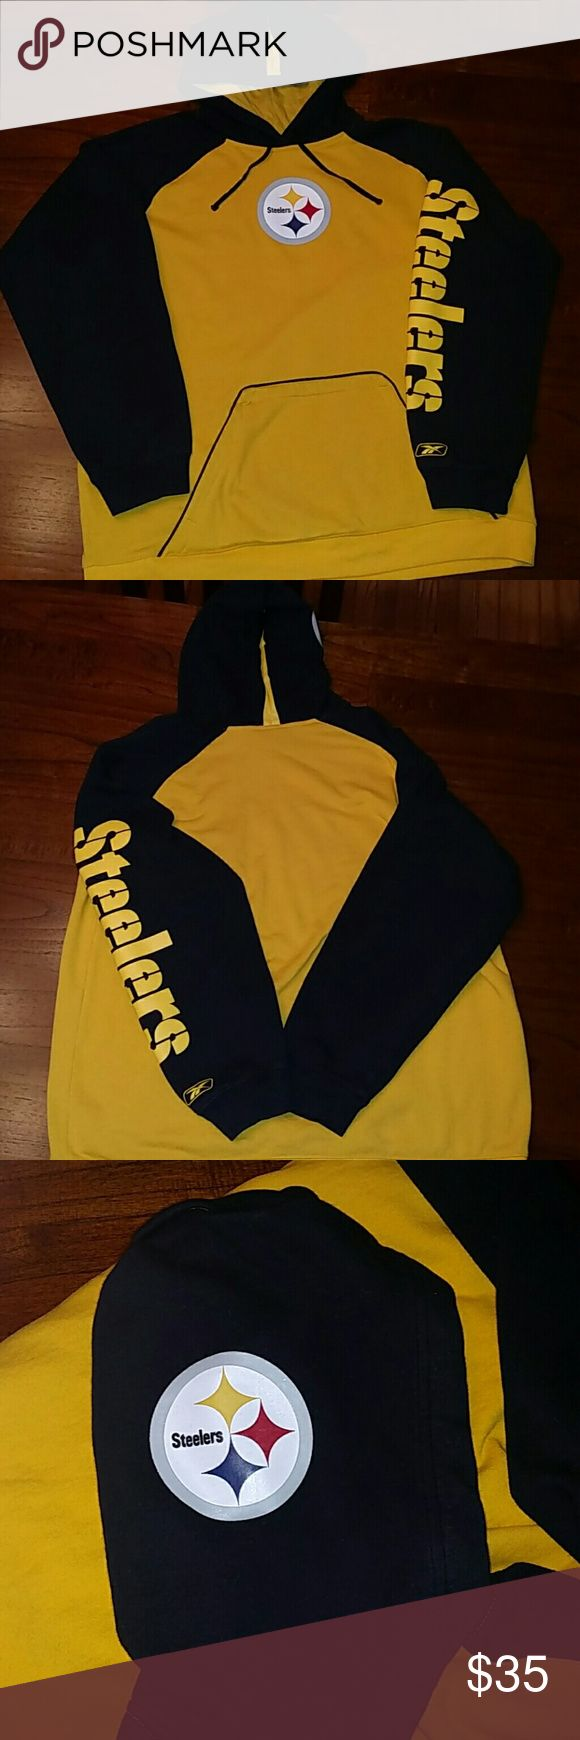 NFL Reebok Steelers Hooded Sweatshirt Gently worn Steelers Sweatshirt. Emblem on front and side of hood. Front pocket. NFL Shirts Sweatshirts & Hoodies